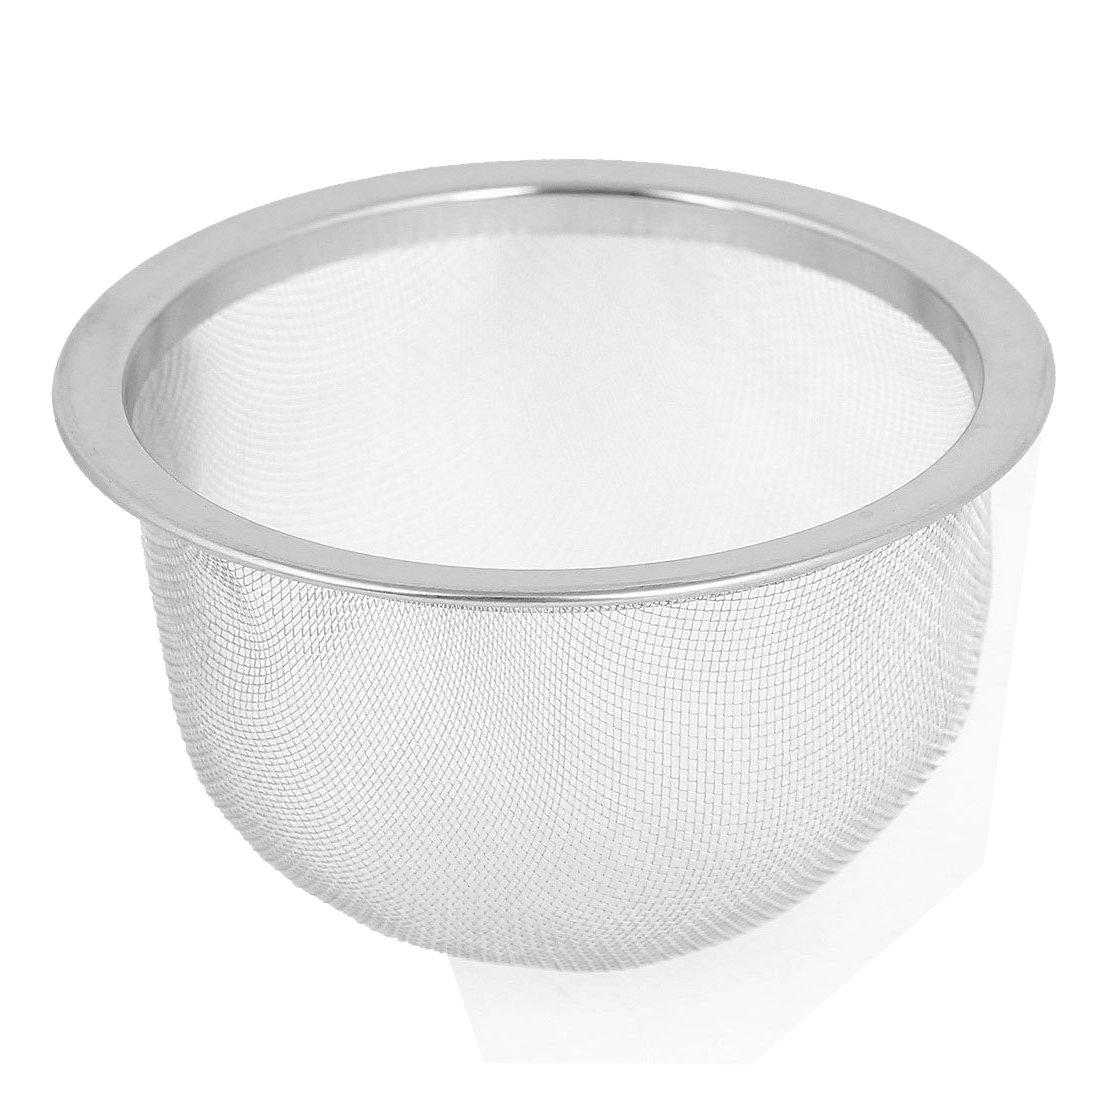 Tea Leaves Filter - TOOGOO(R) 76mm Silver Tone Stainless Steel Wire Mesh Tea Leaves Spice Strainer Basket